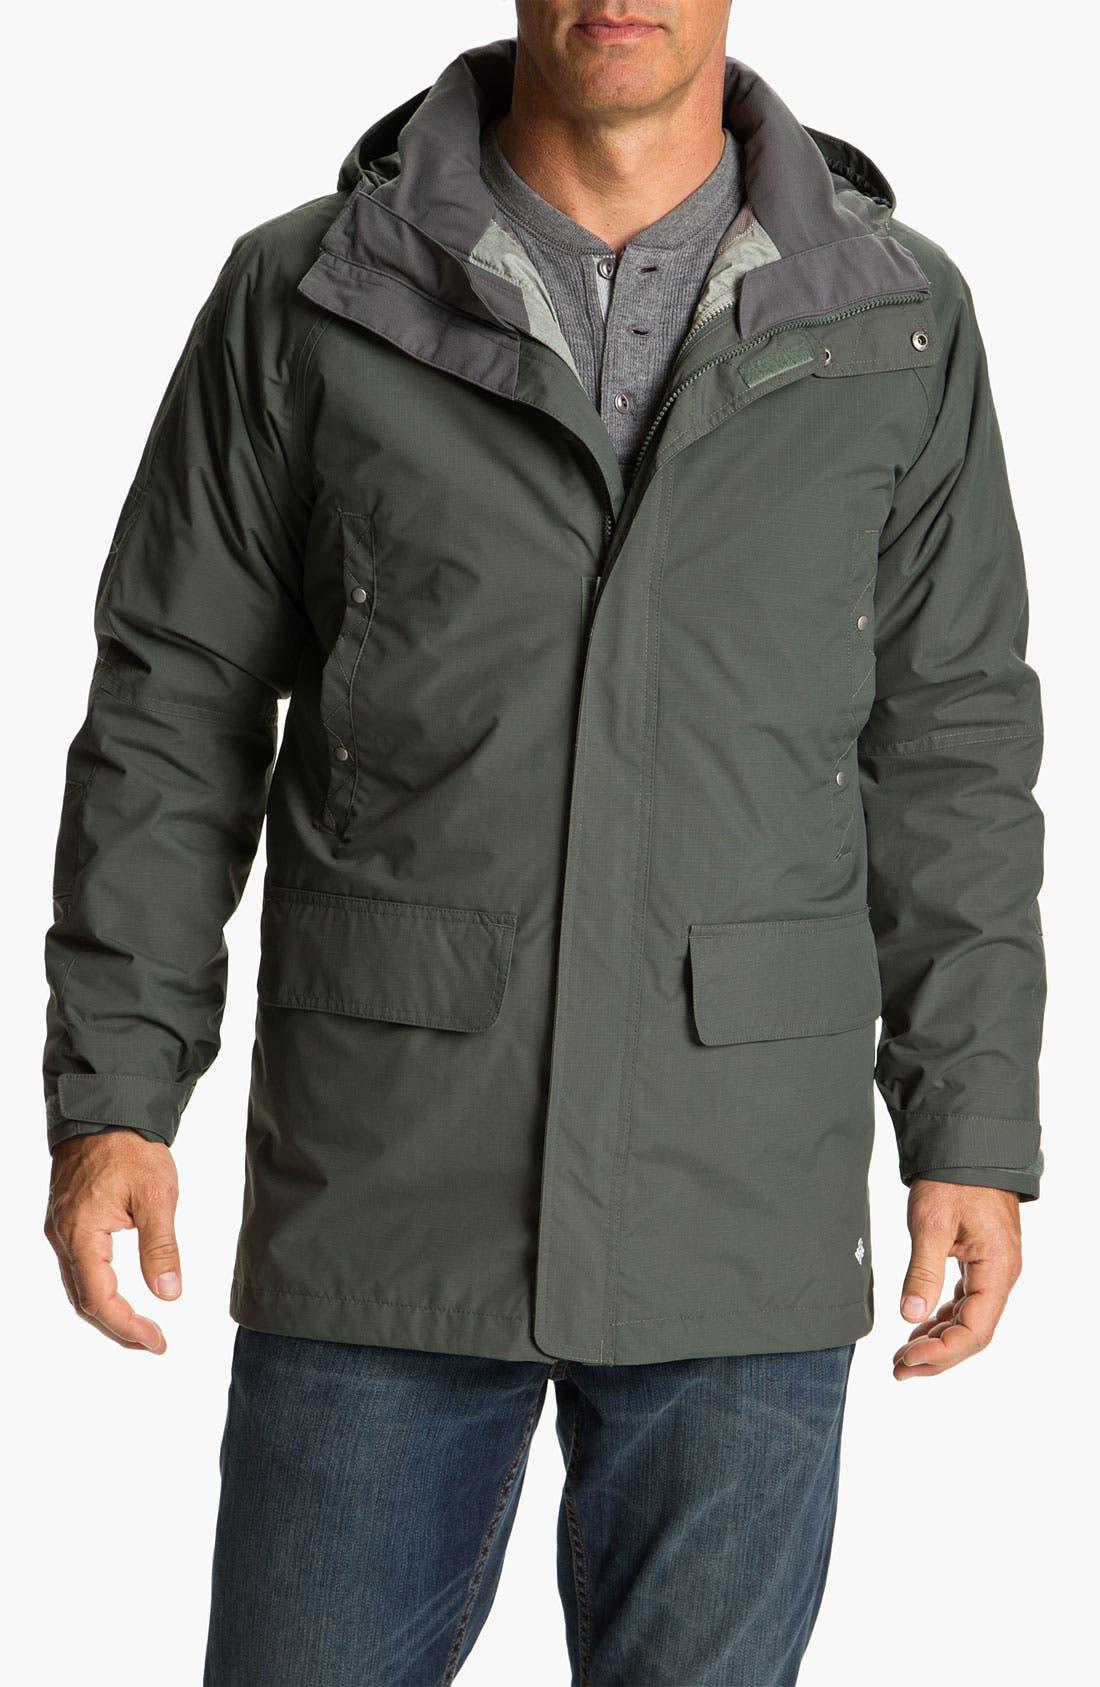 Alternate Image 1 Selected - Columbia 'Saskatoon' Interchange Jacket